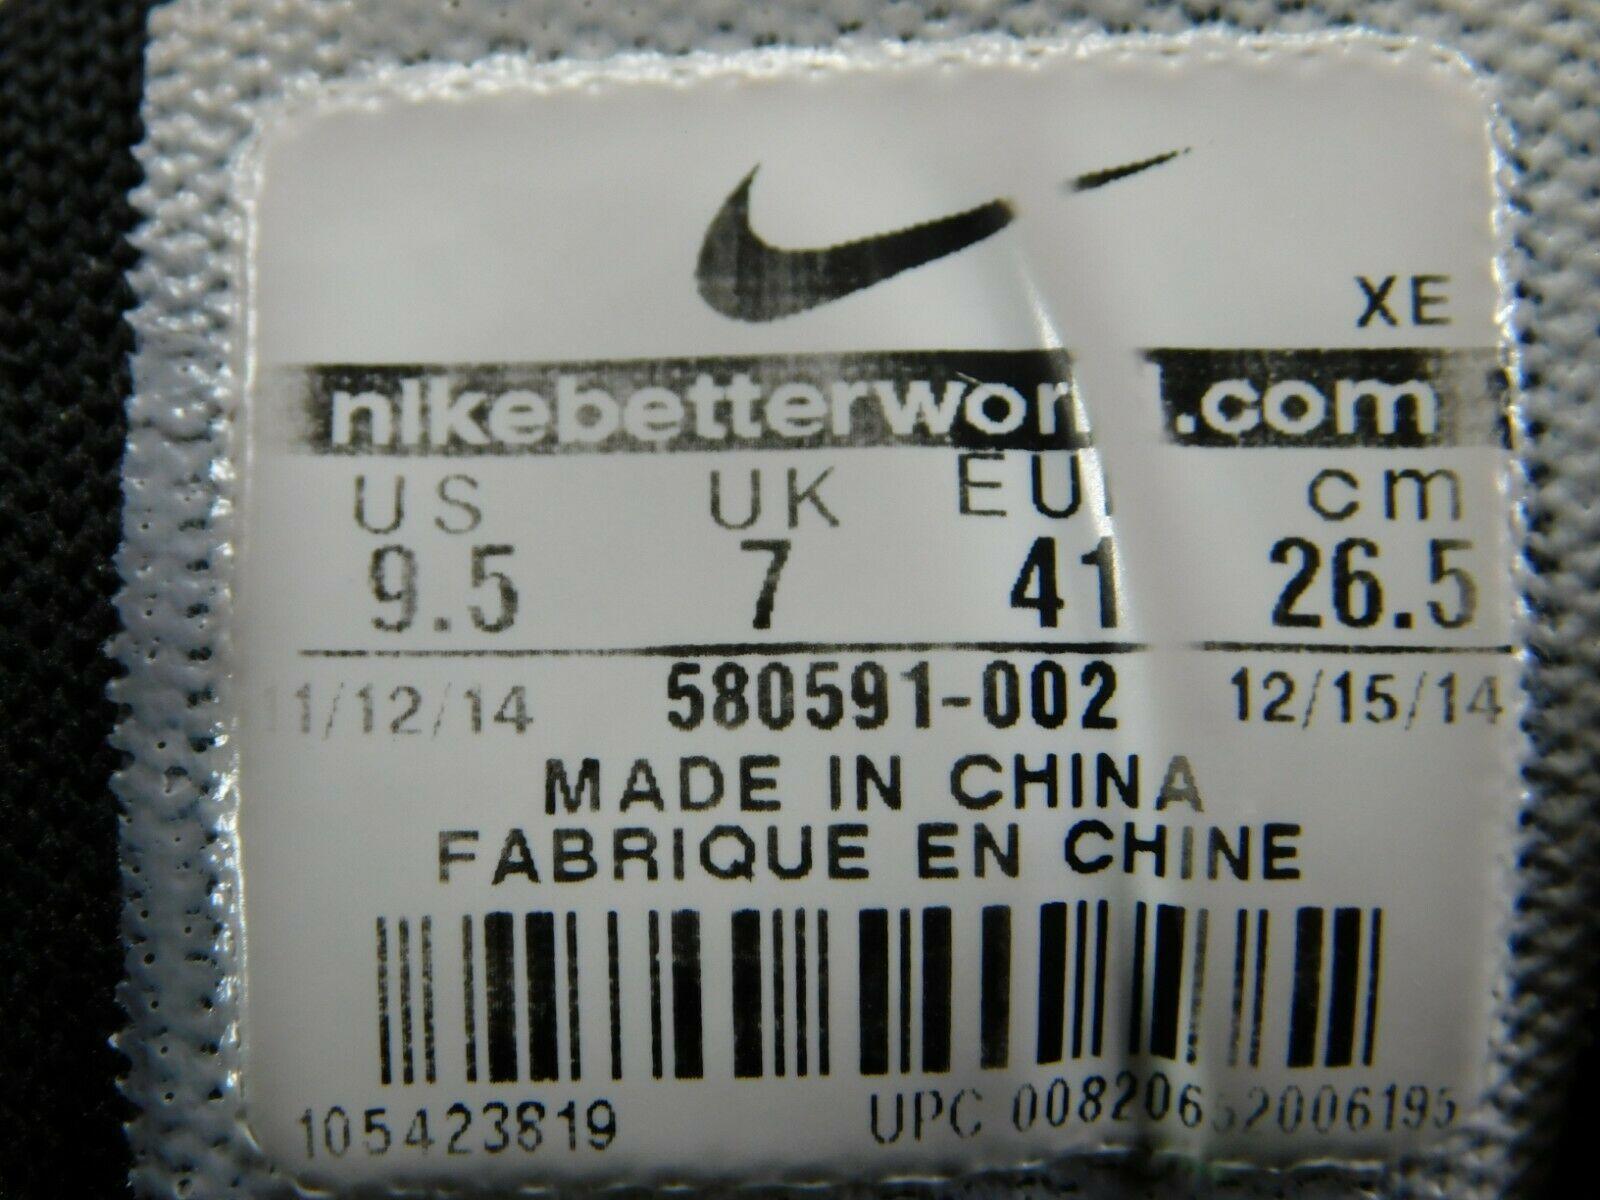 Nike Free 5.0+ Size US 9.5 M (D) EU 41 Women's Running Shoes Black 580591-002 image 11